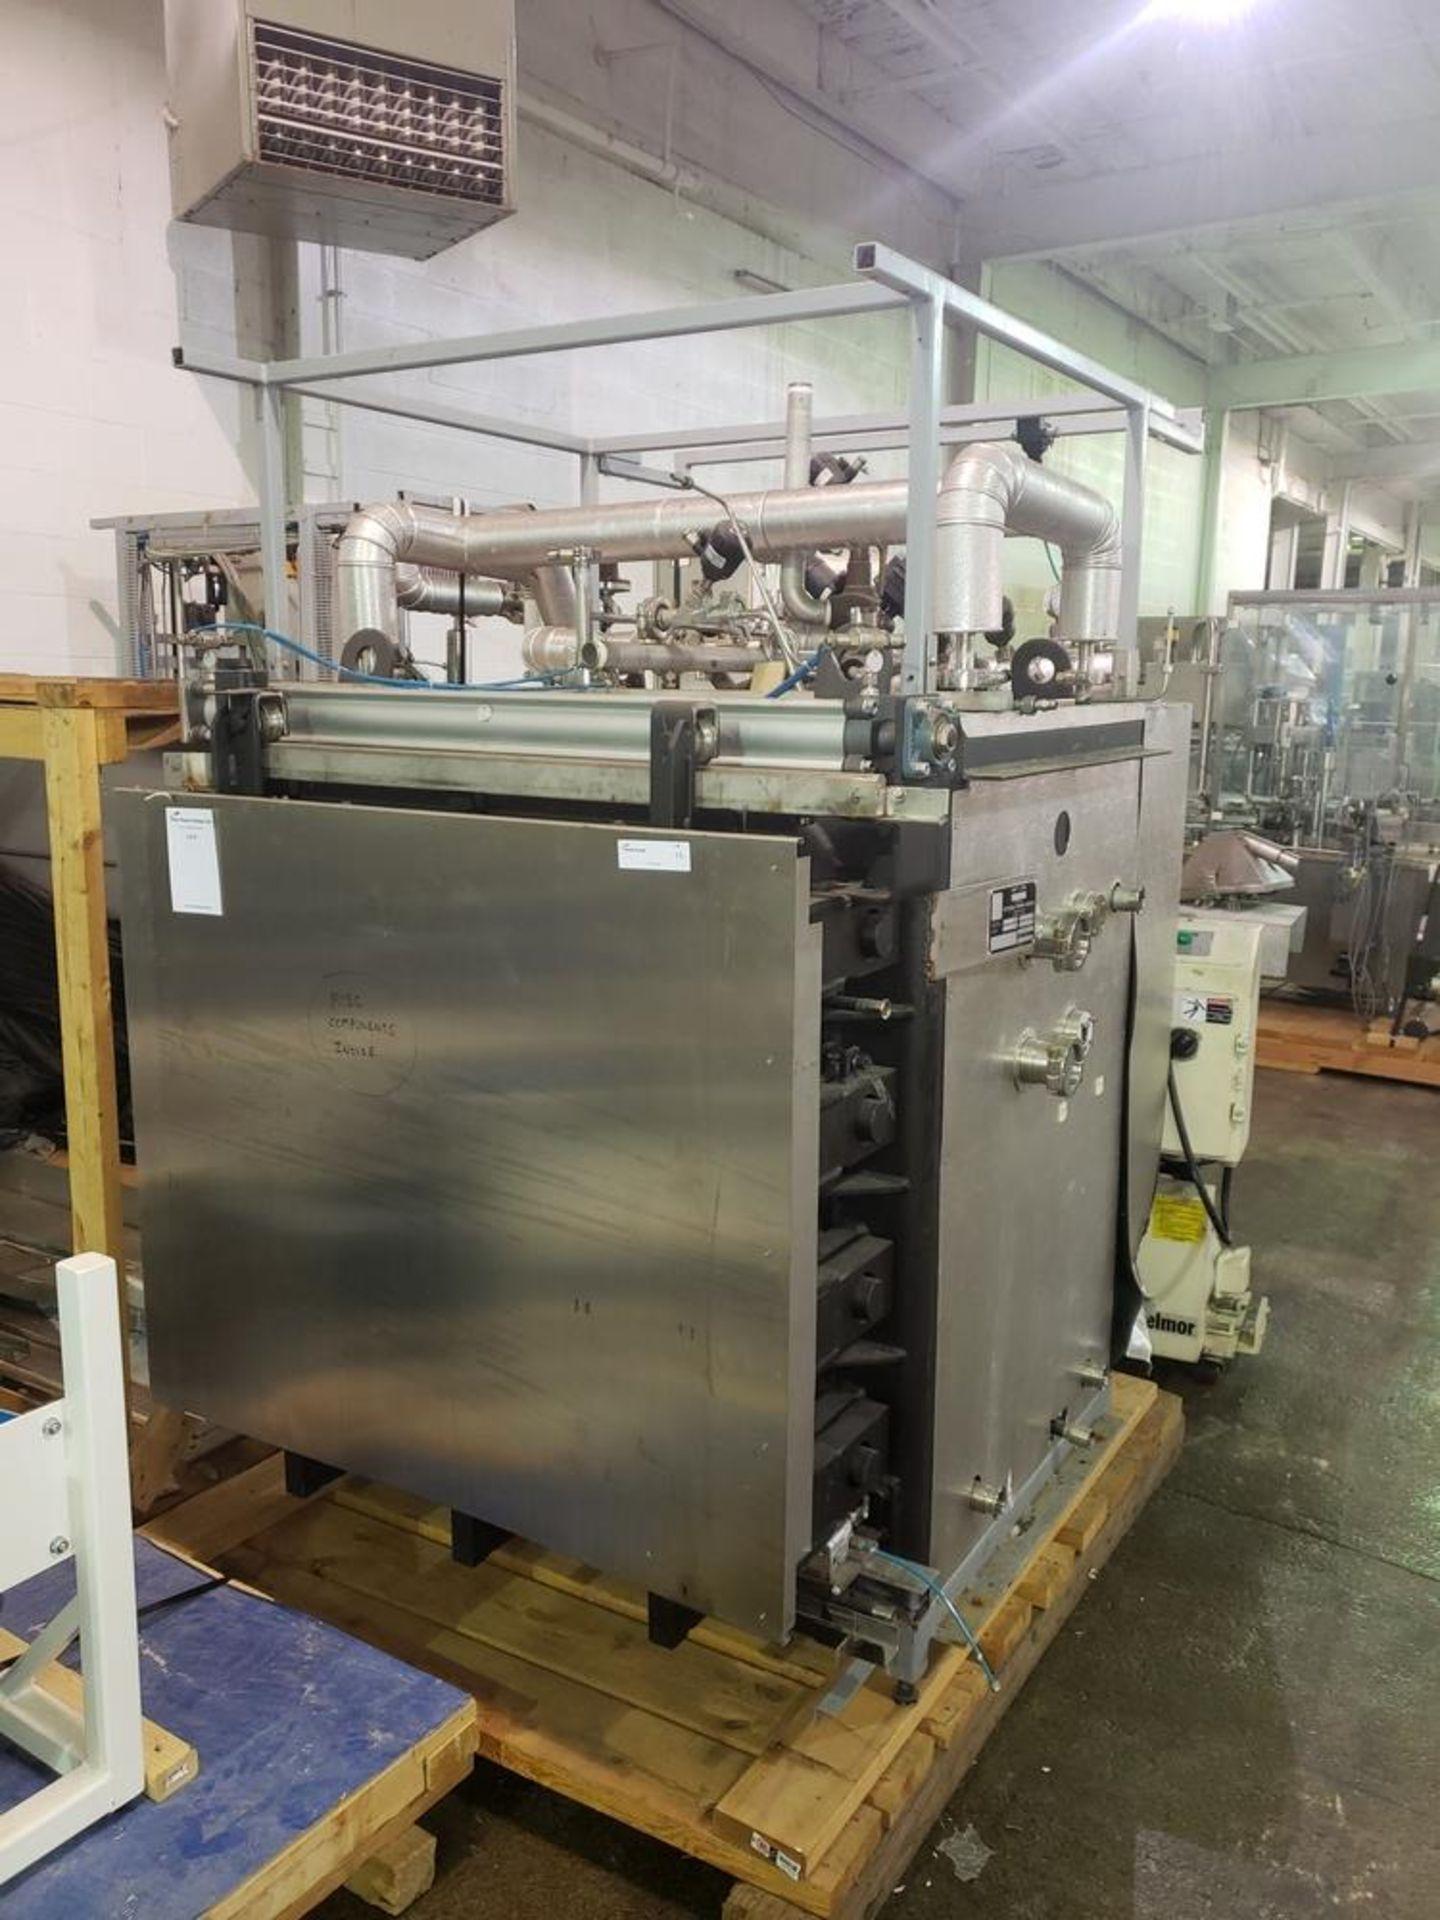 Lot 11 - Steris Finn Aqua sterilizer autoclave, model 9912-B-GMP, stainless steel contact surfaces